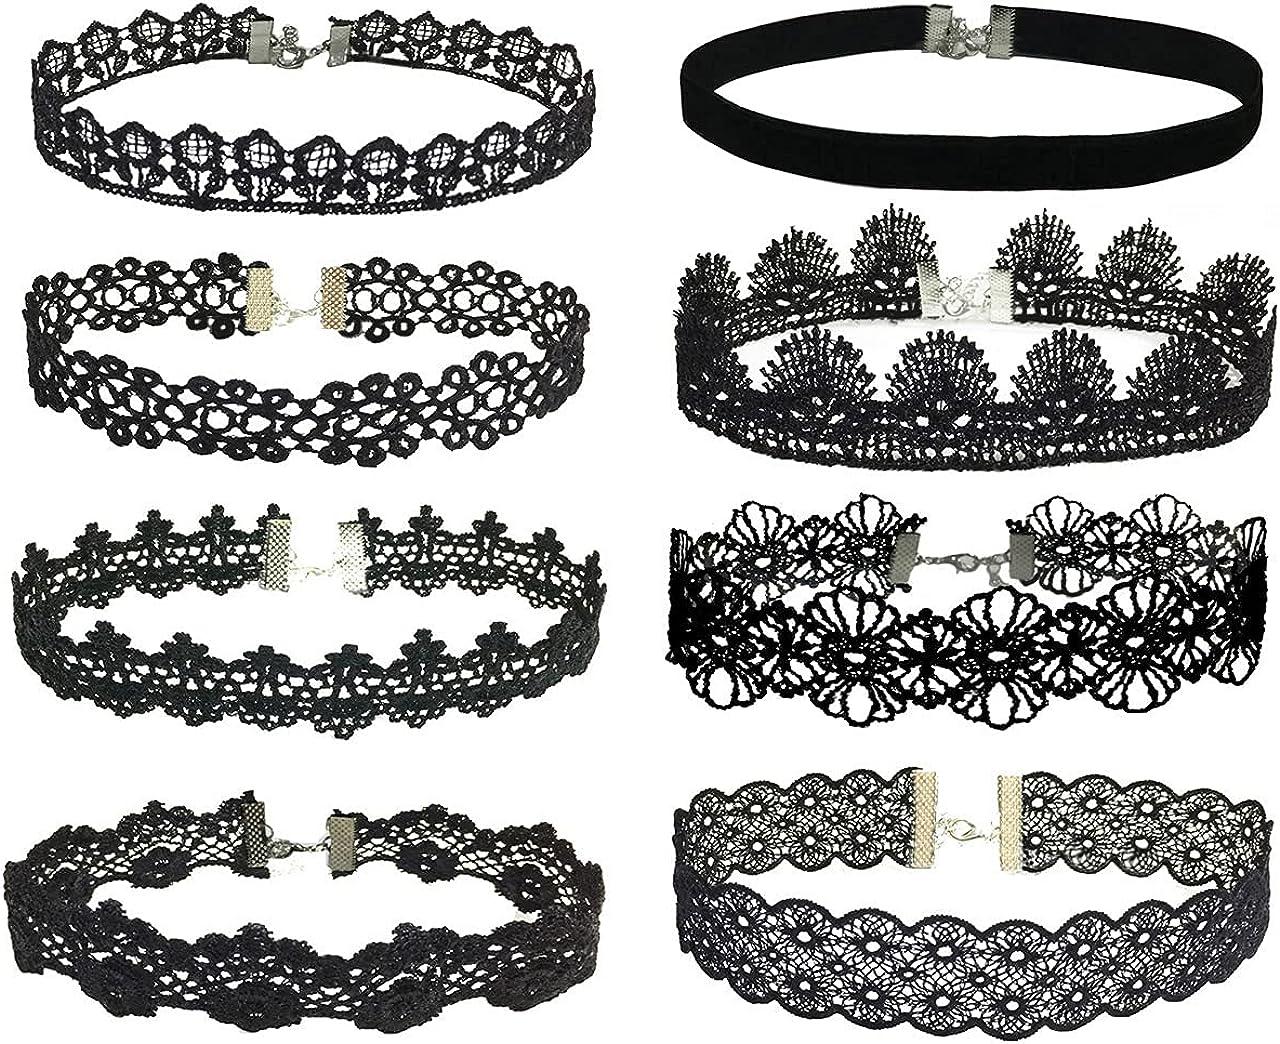 Manfnee Choker Necklace Set Gothic Tattoo Lolita Choker for Women Girls